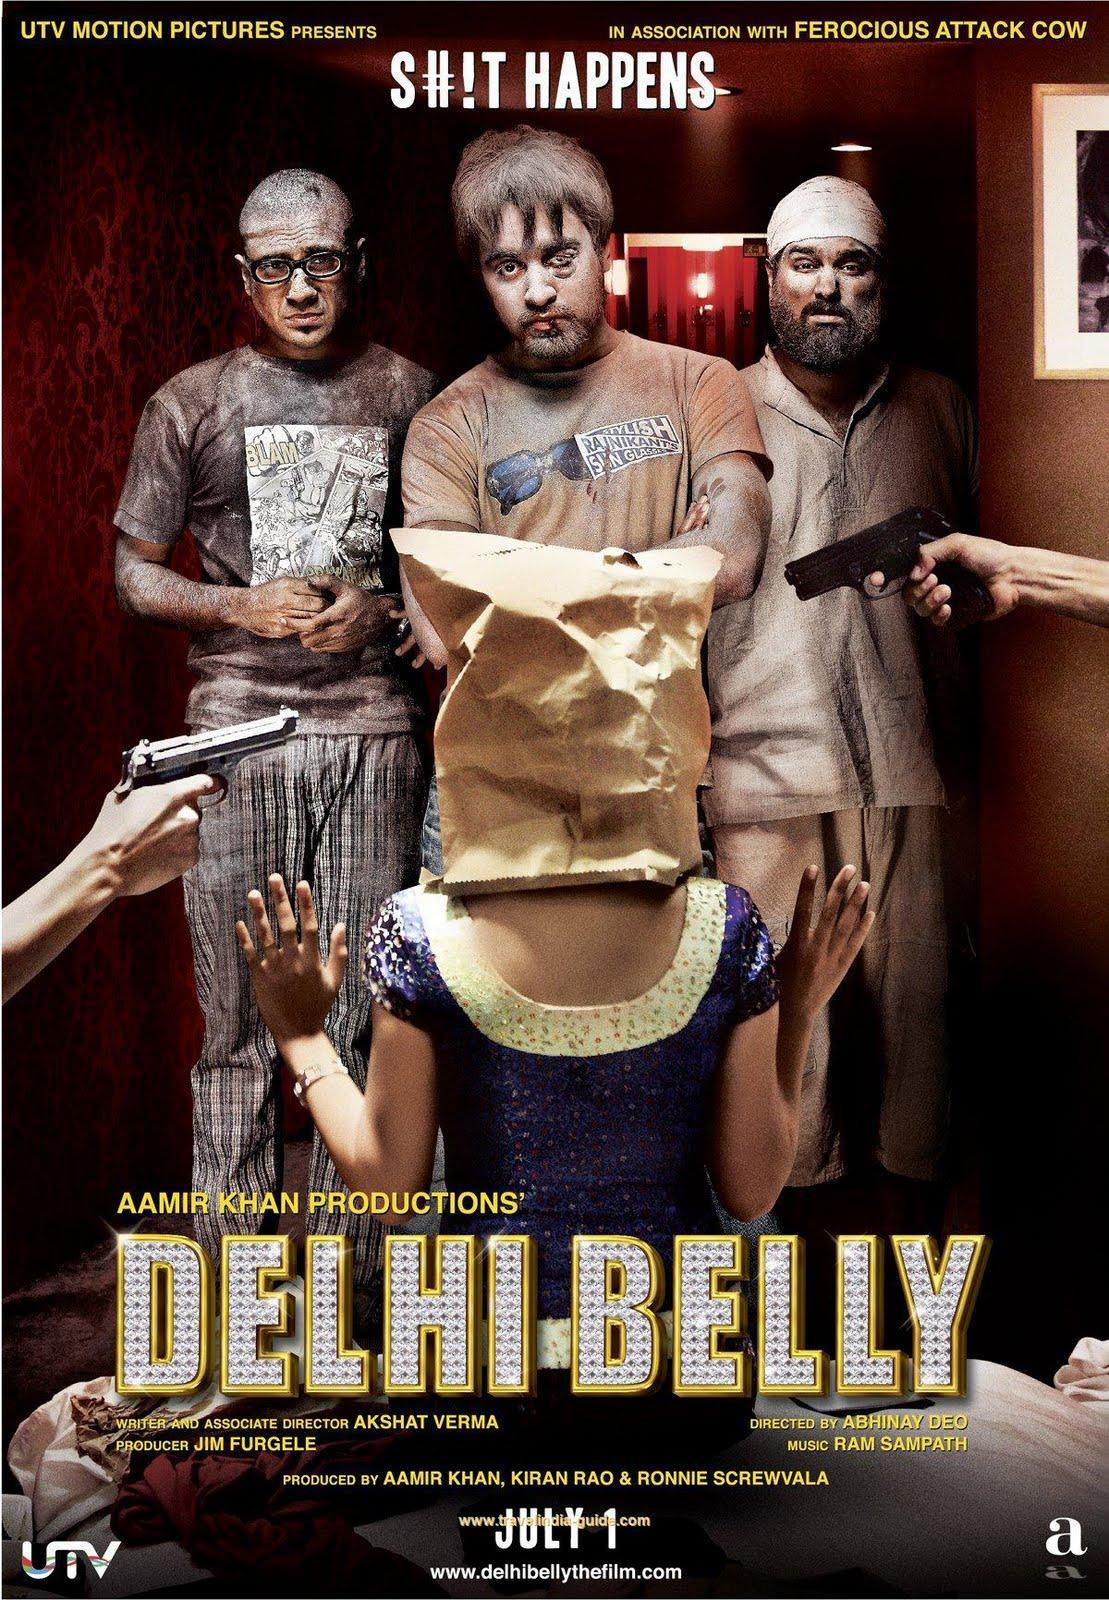 http://1.bp.blogspot.com/-Kobp7YGIuKI/ToX-DEsERyI/AAAAAAAABH4/bsw4NNSw89c/s1600/delhi-belly-movie-wallpaper-GFX.jpg